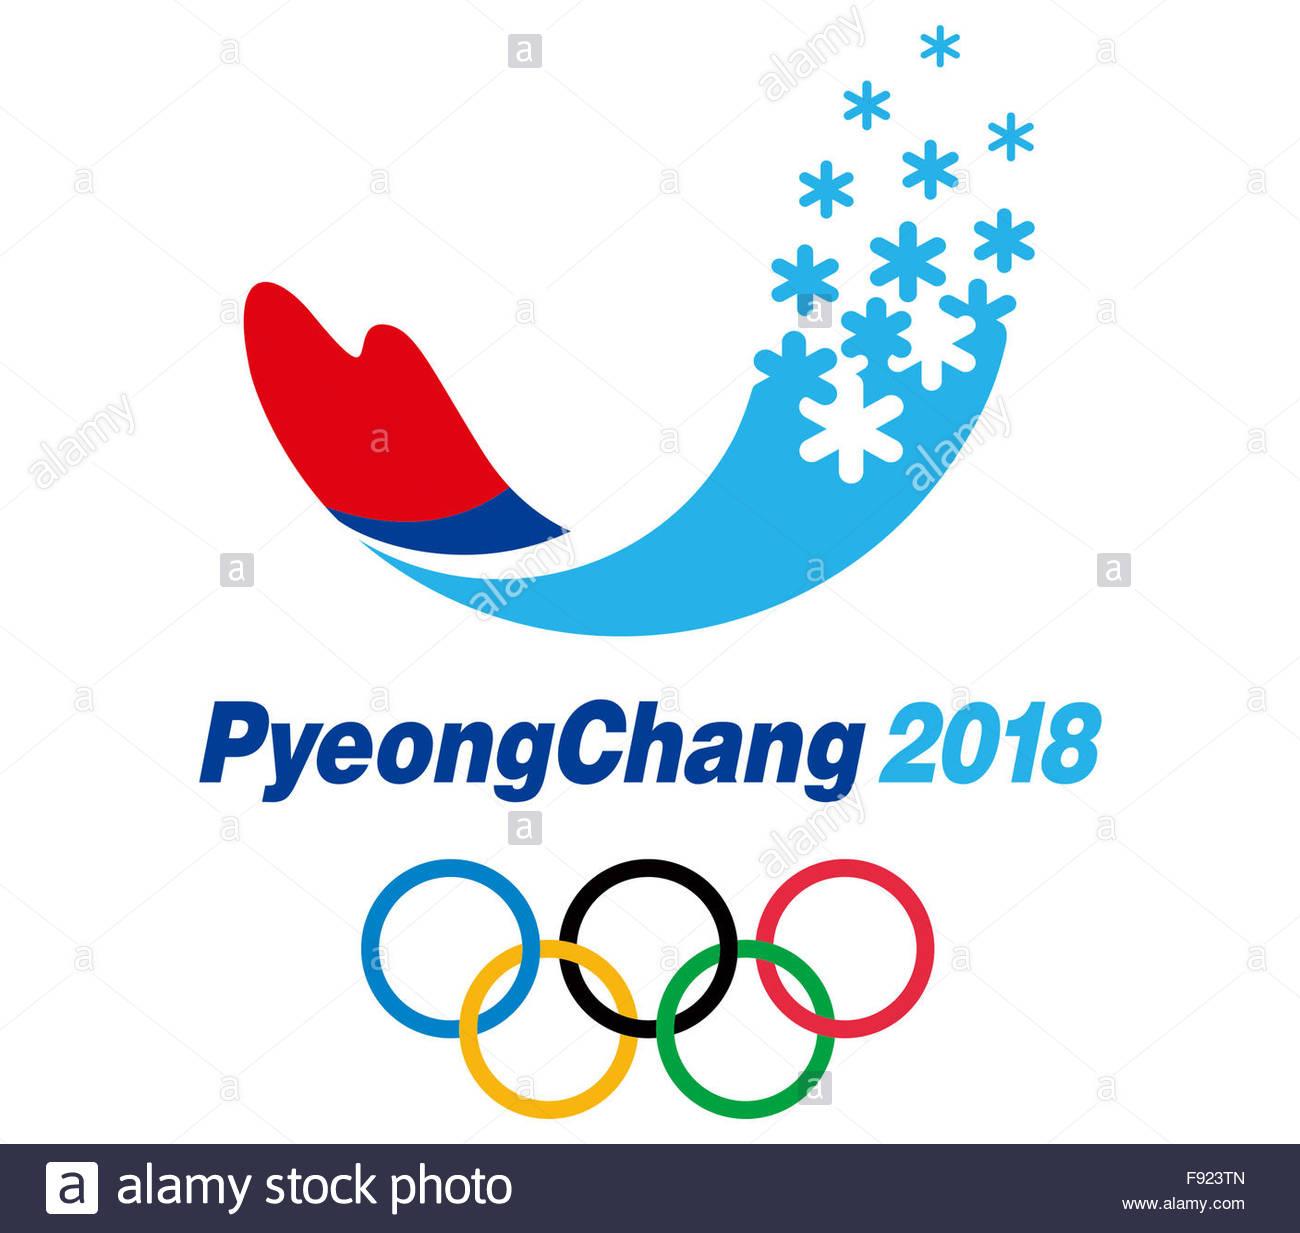 Pyeongchang 2018 Olympic Games Logo Icon Symbol Stock Photo